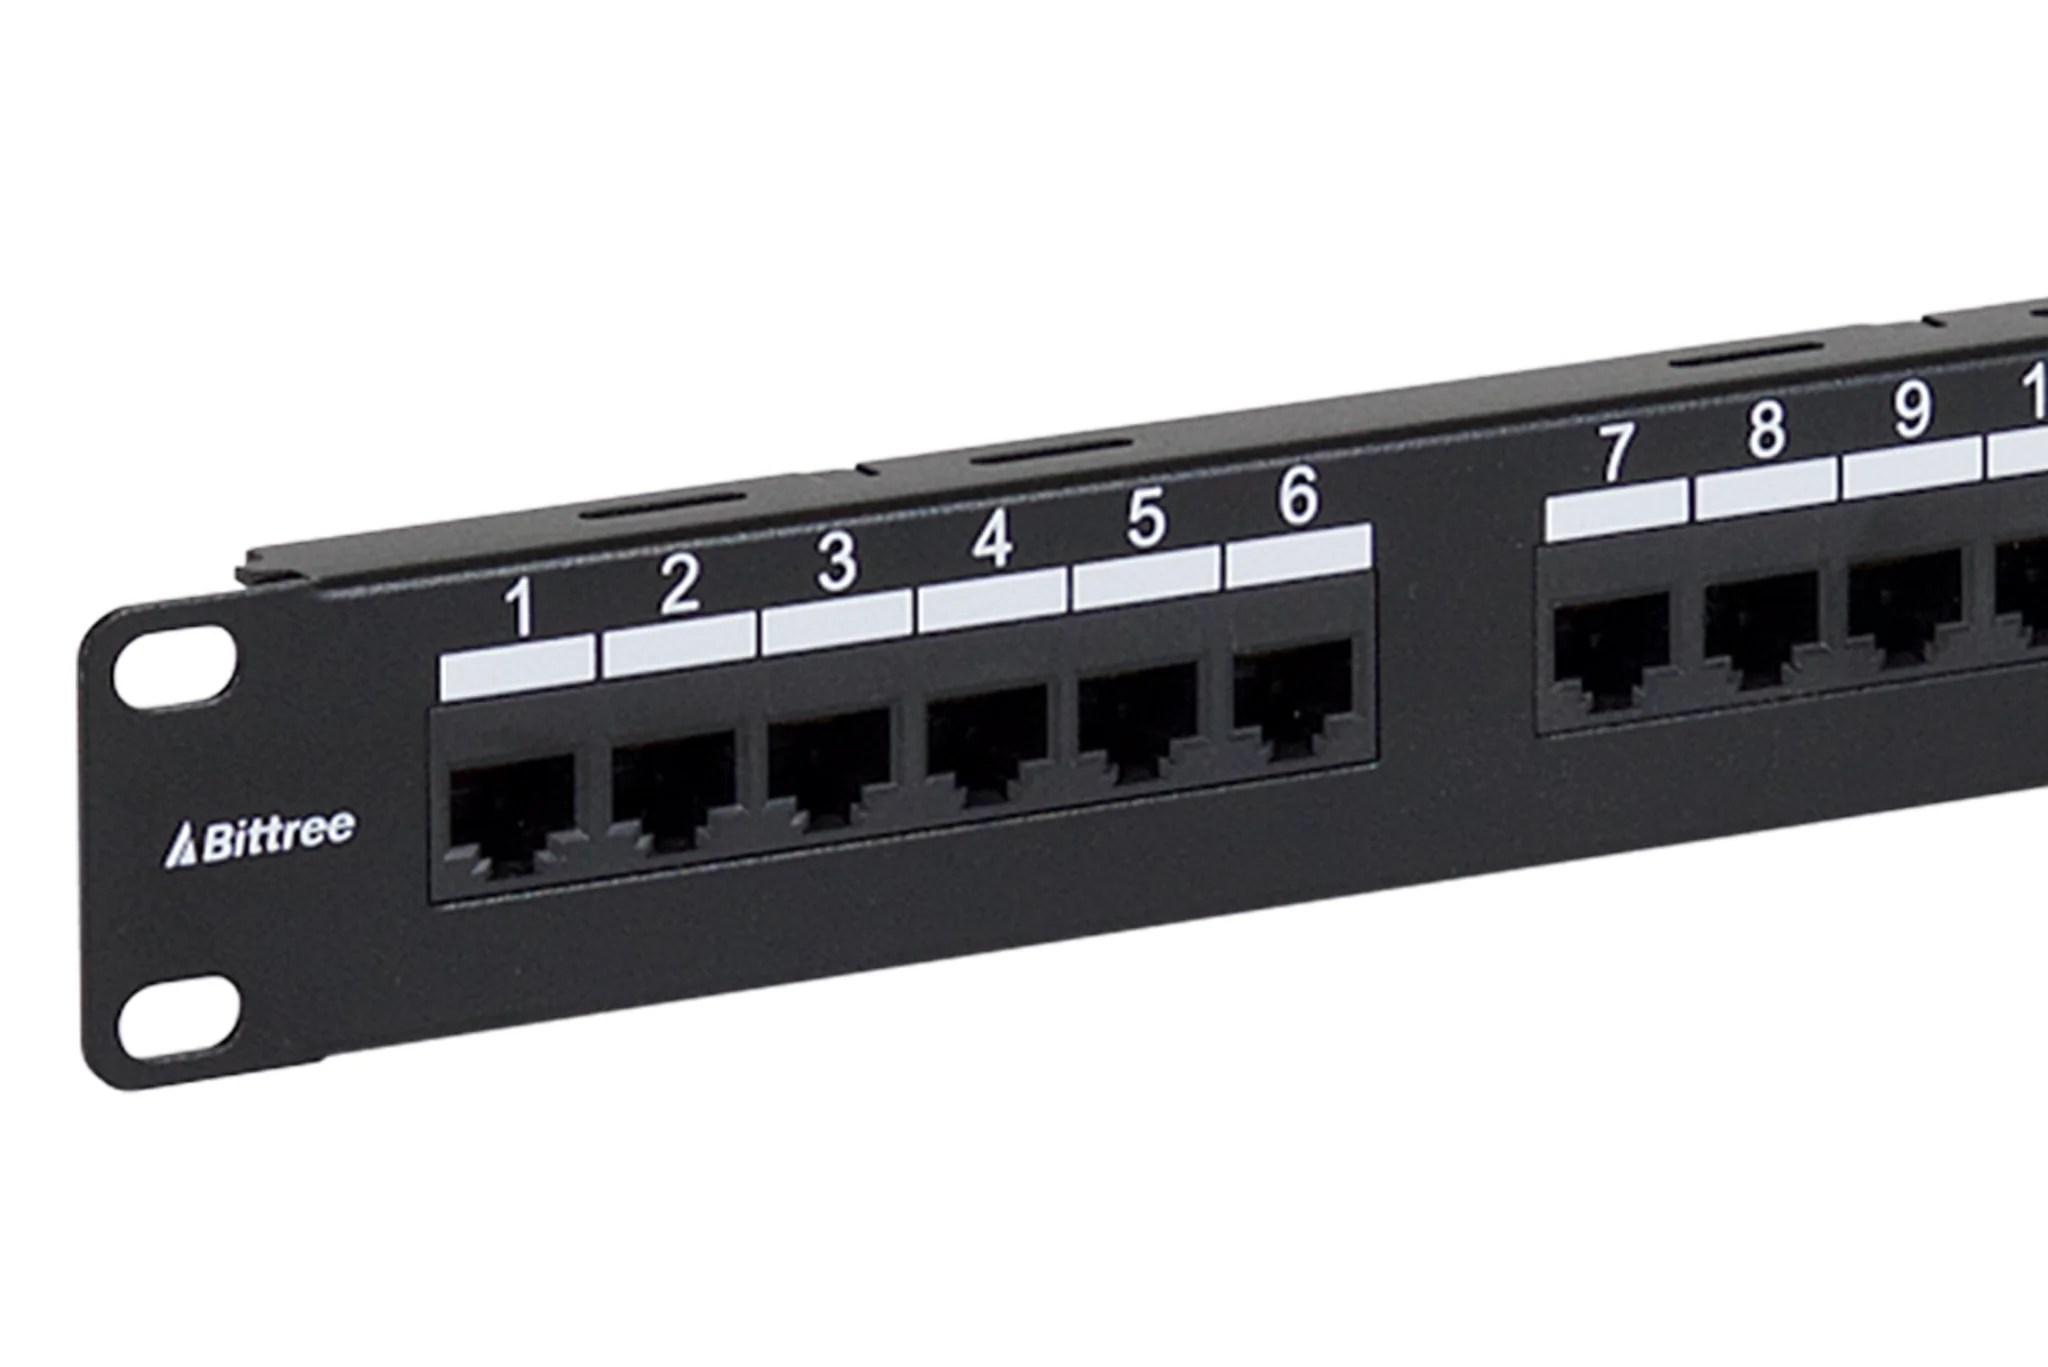 hight resolution of  flush mount gigabit ethernet panel cat 6 110 punchdown unshielded 1x24